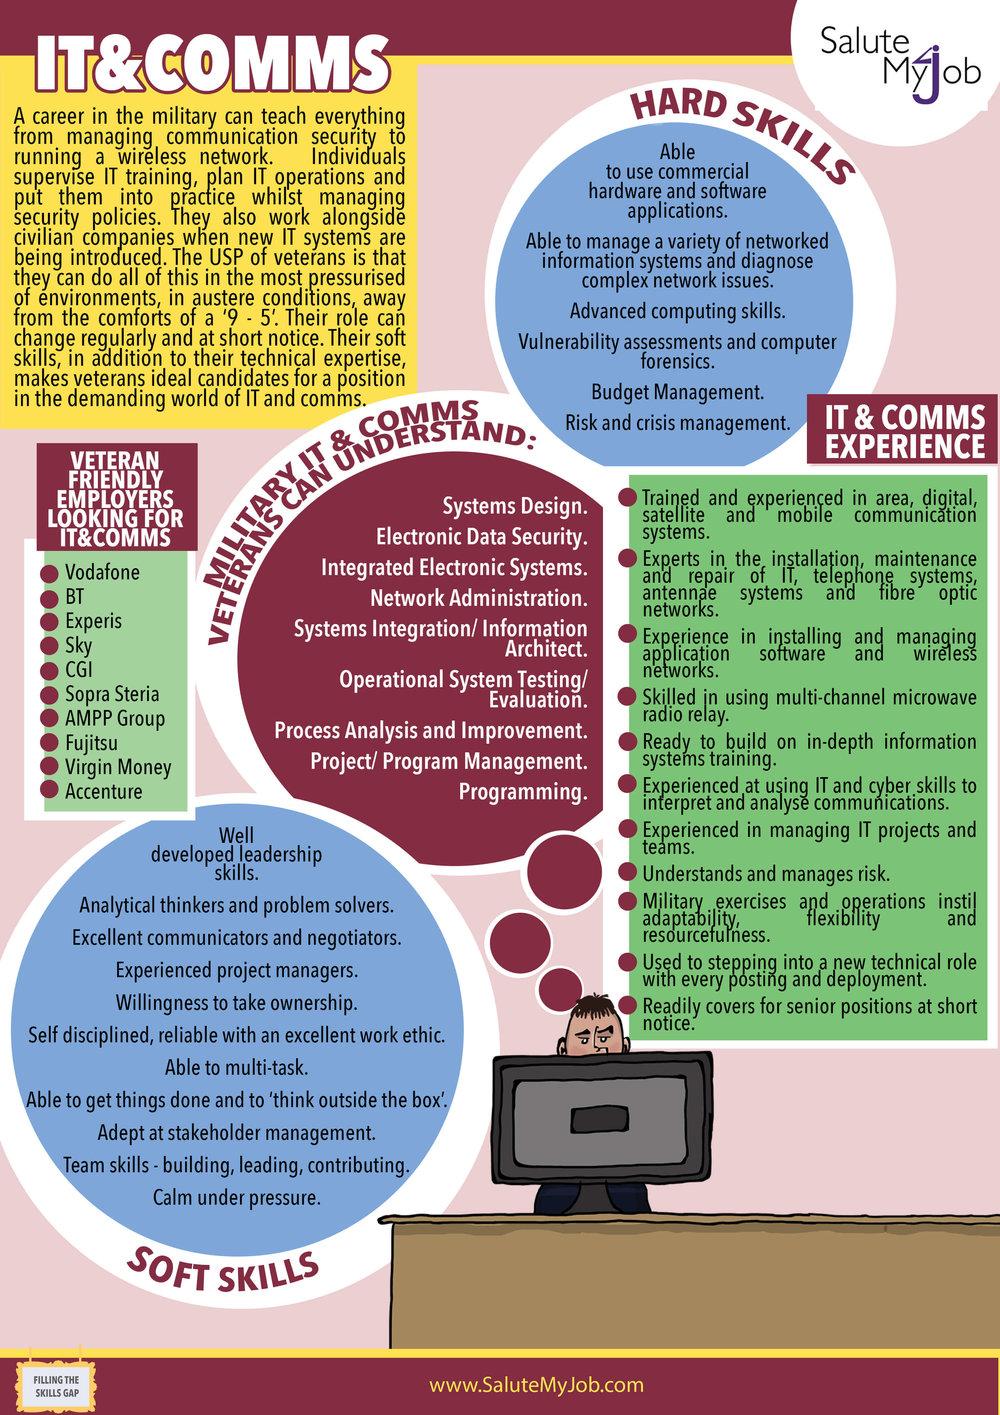 Skills Translation - it & comms.jpg